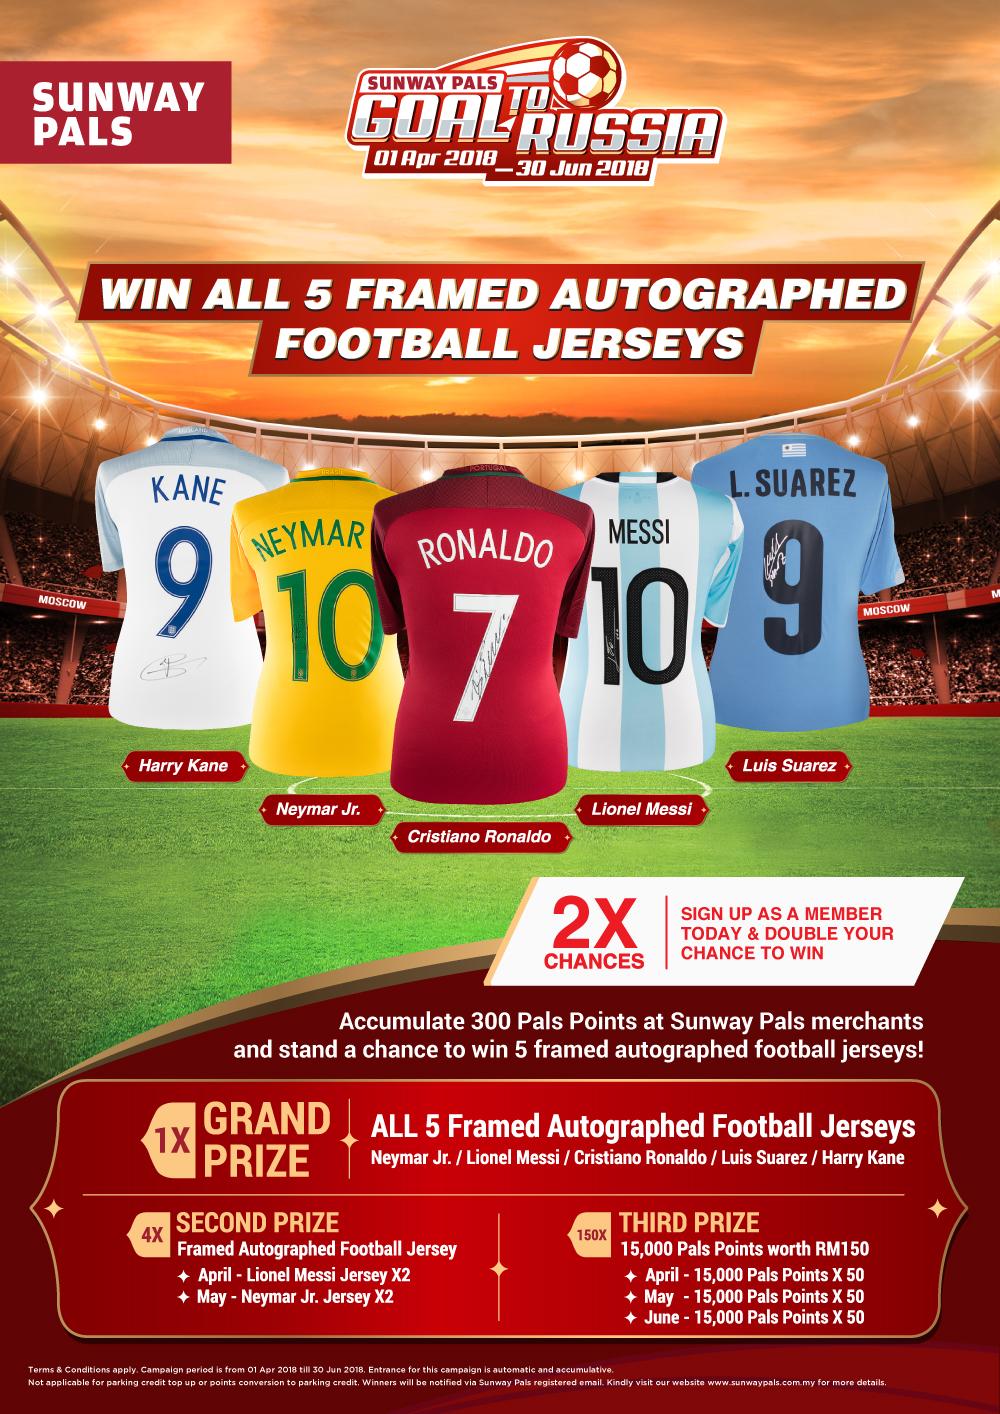 Win 5 Framed Autographed Football Jerseys